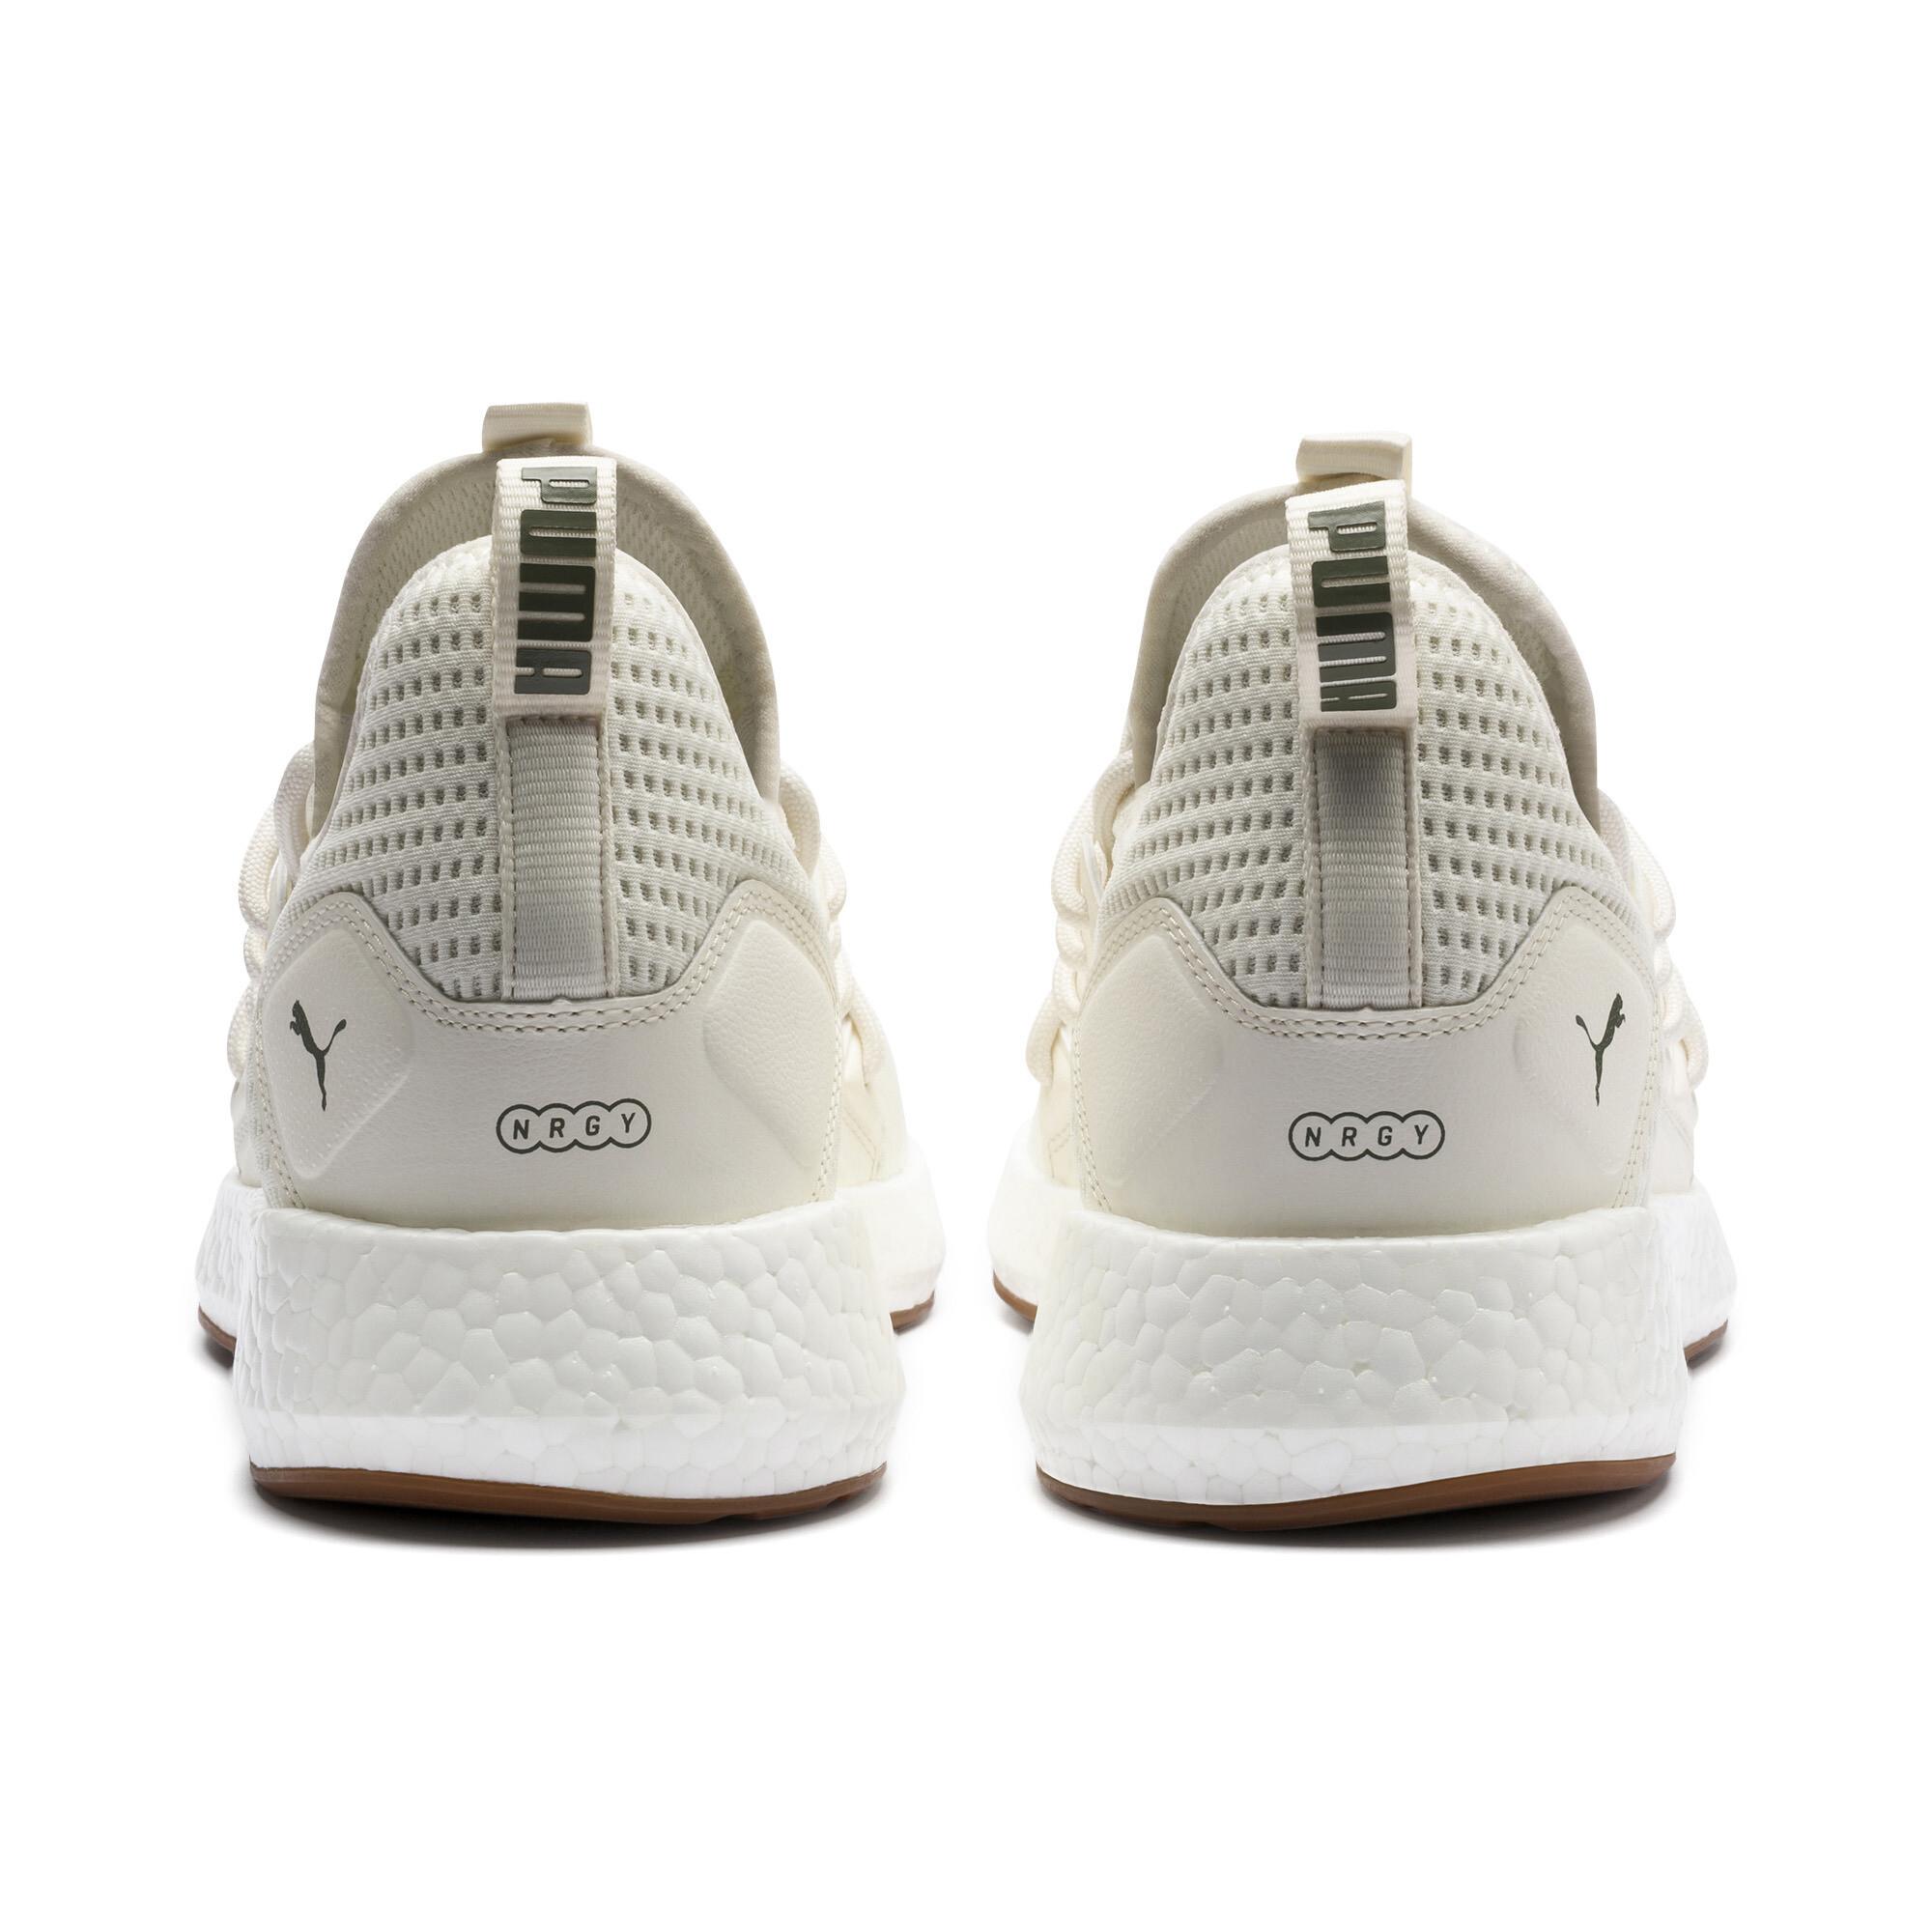 PUMA-NRGY-Neko-Future-Men-s-Running-Shoes-Men-Shoe-Running thumbnail 3